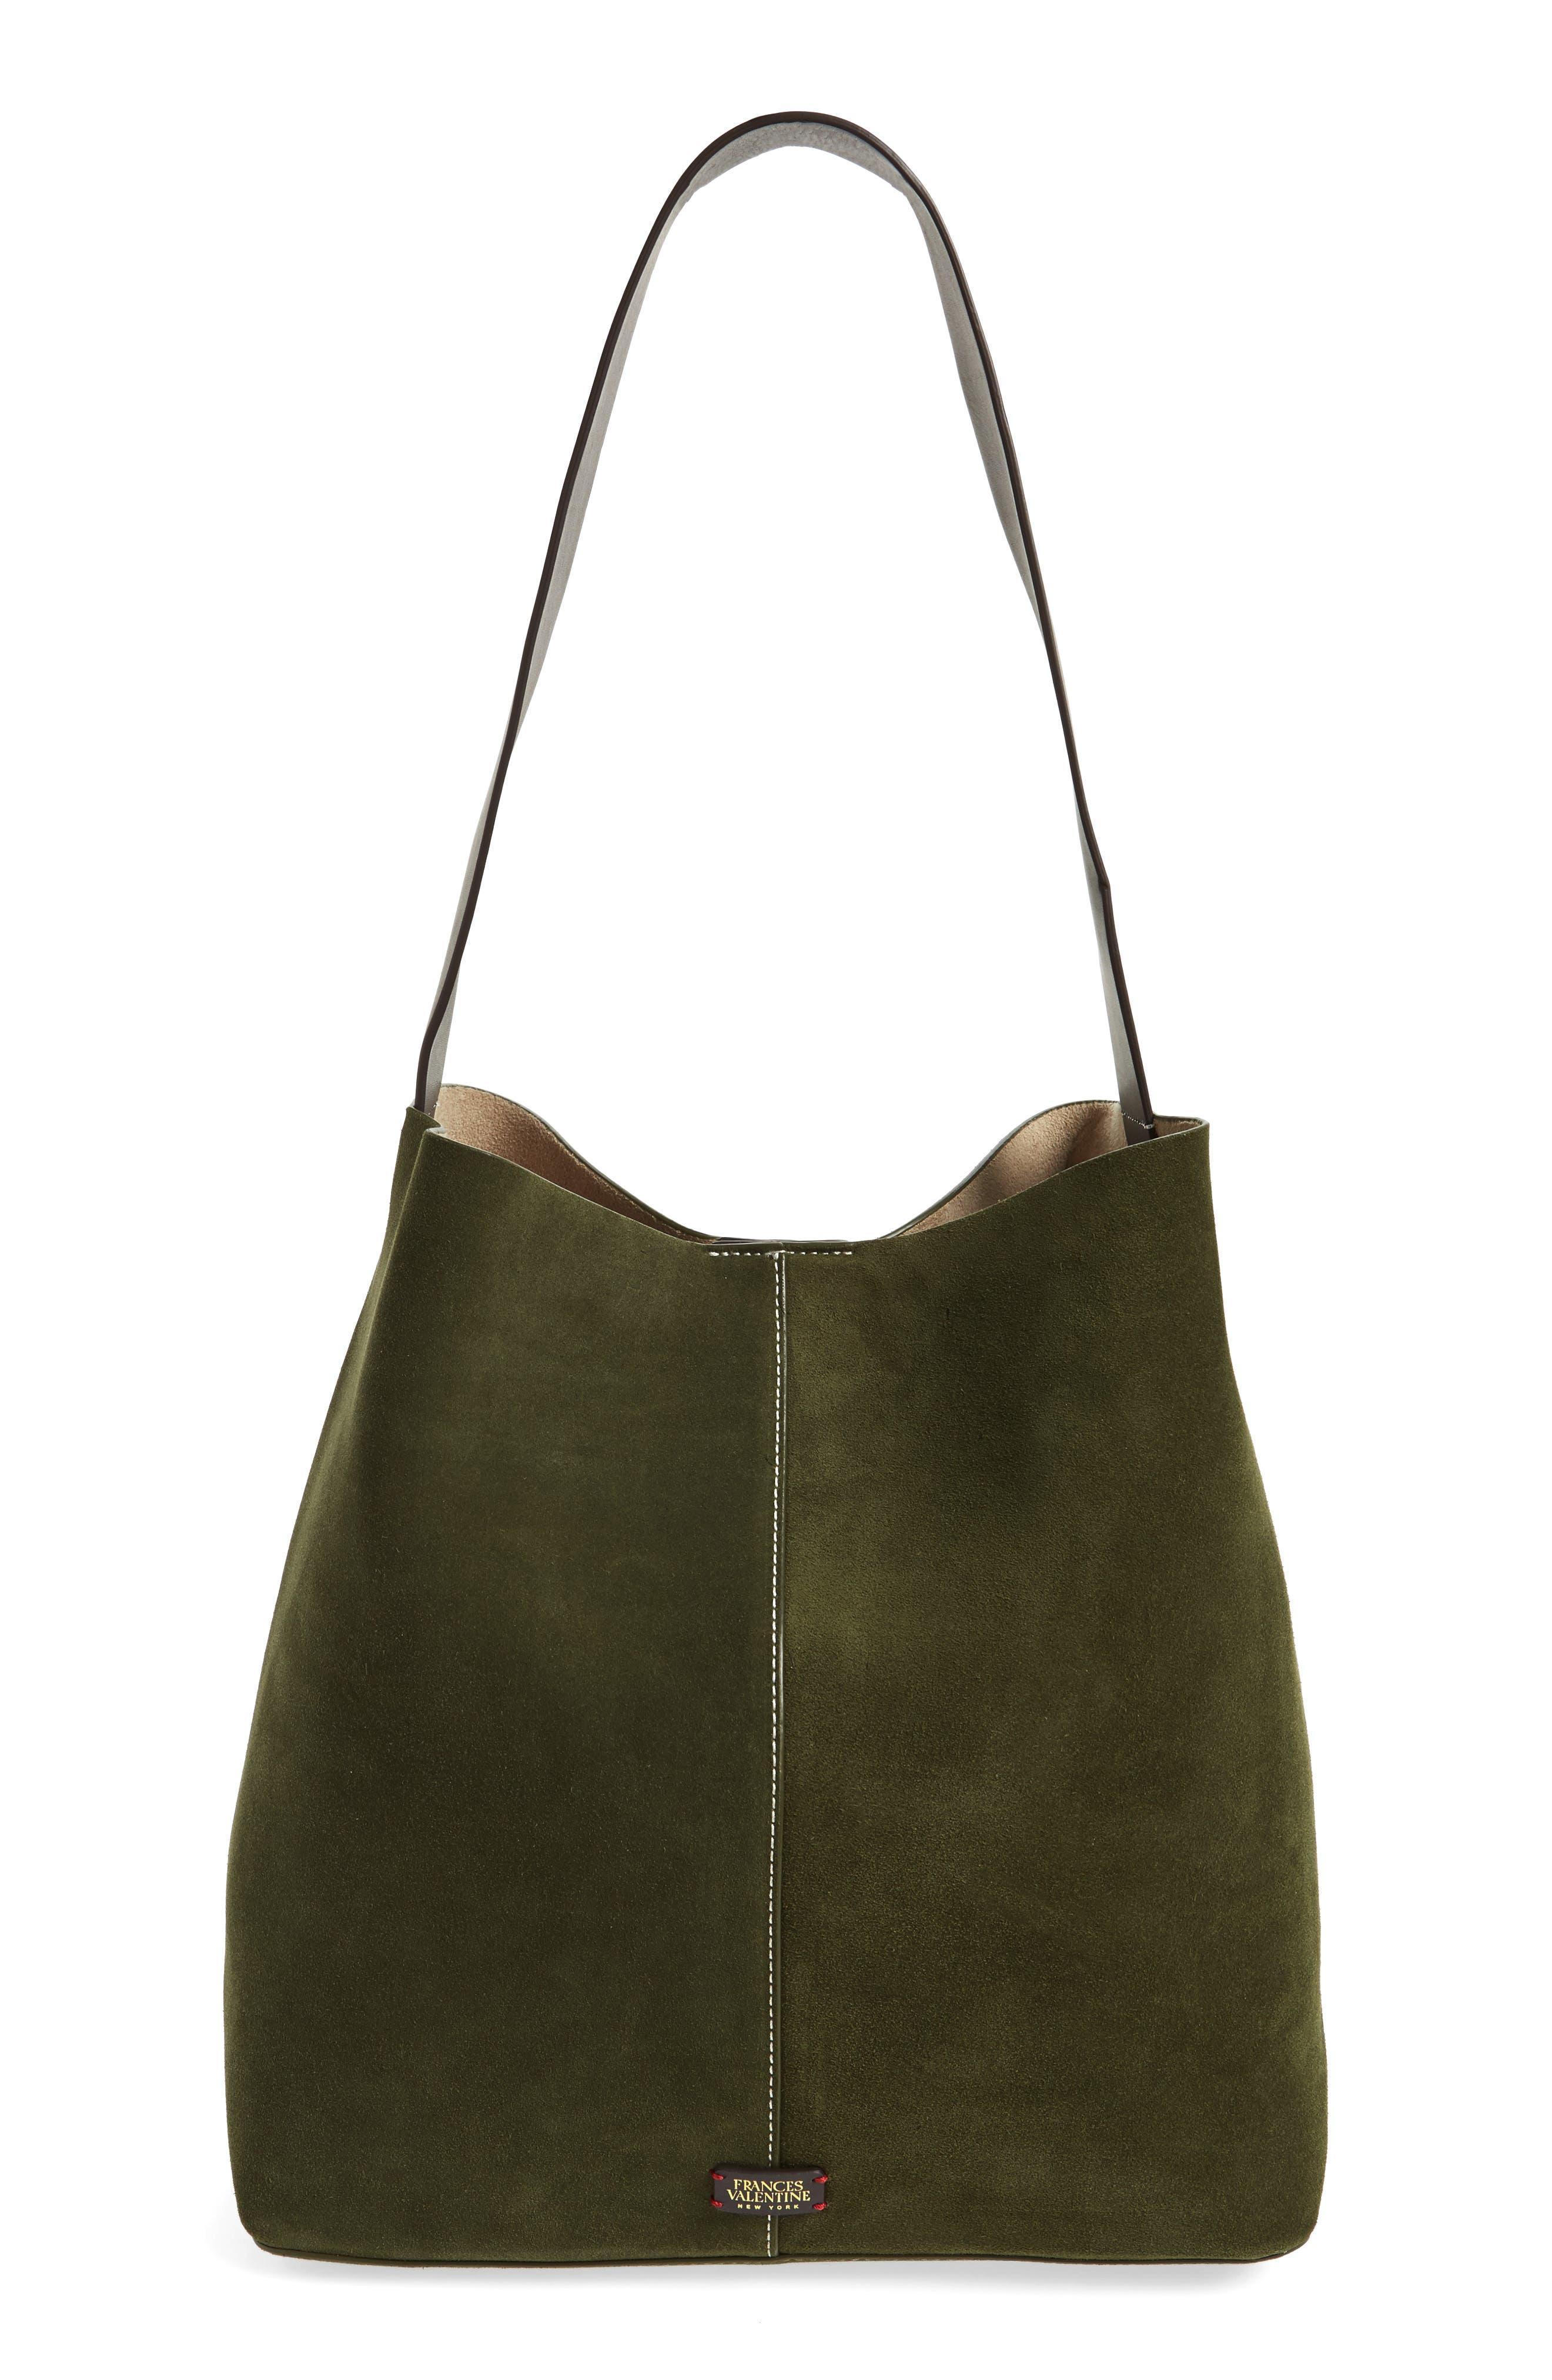 Extra-Large Handbags & Purses | Nordstrom